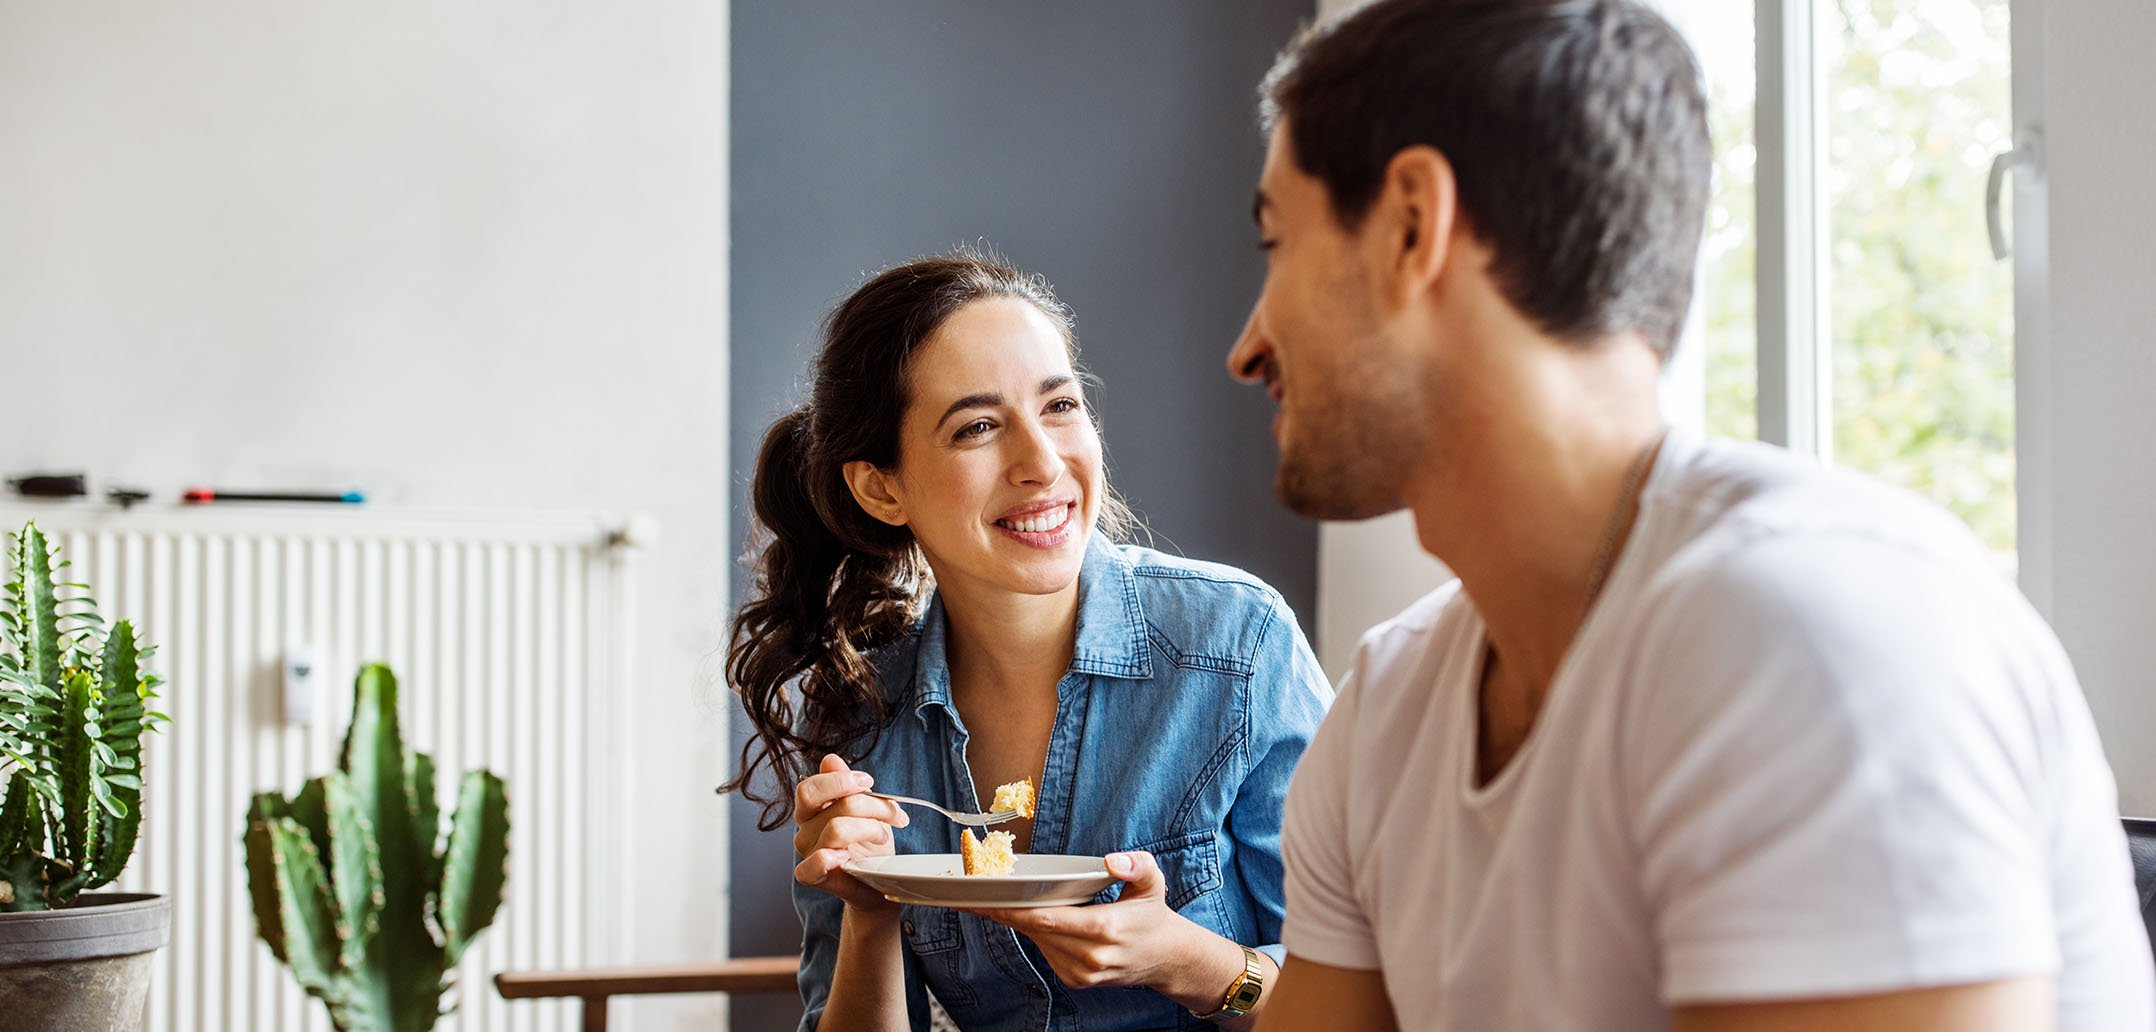 Mann und Frau lächeln sich auf dem Sofa an